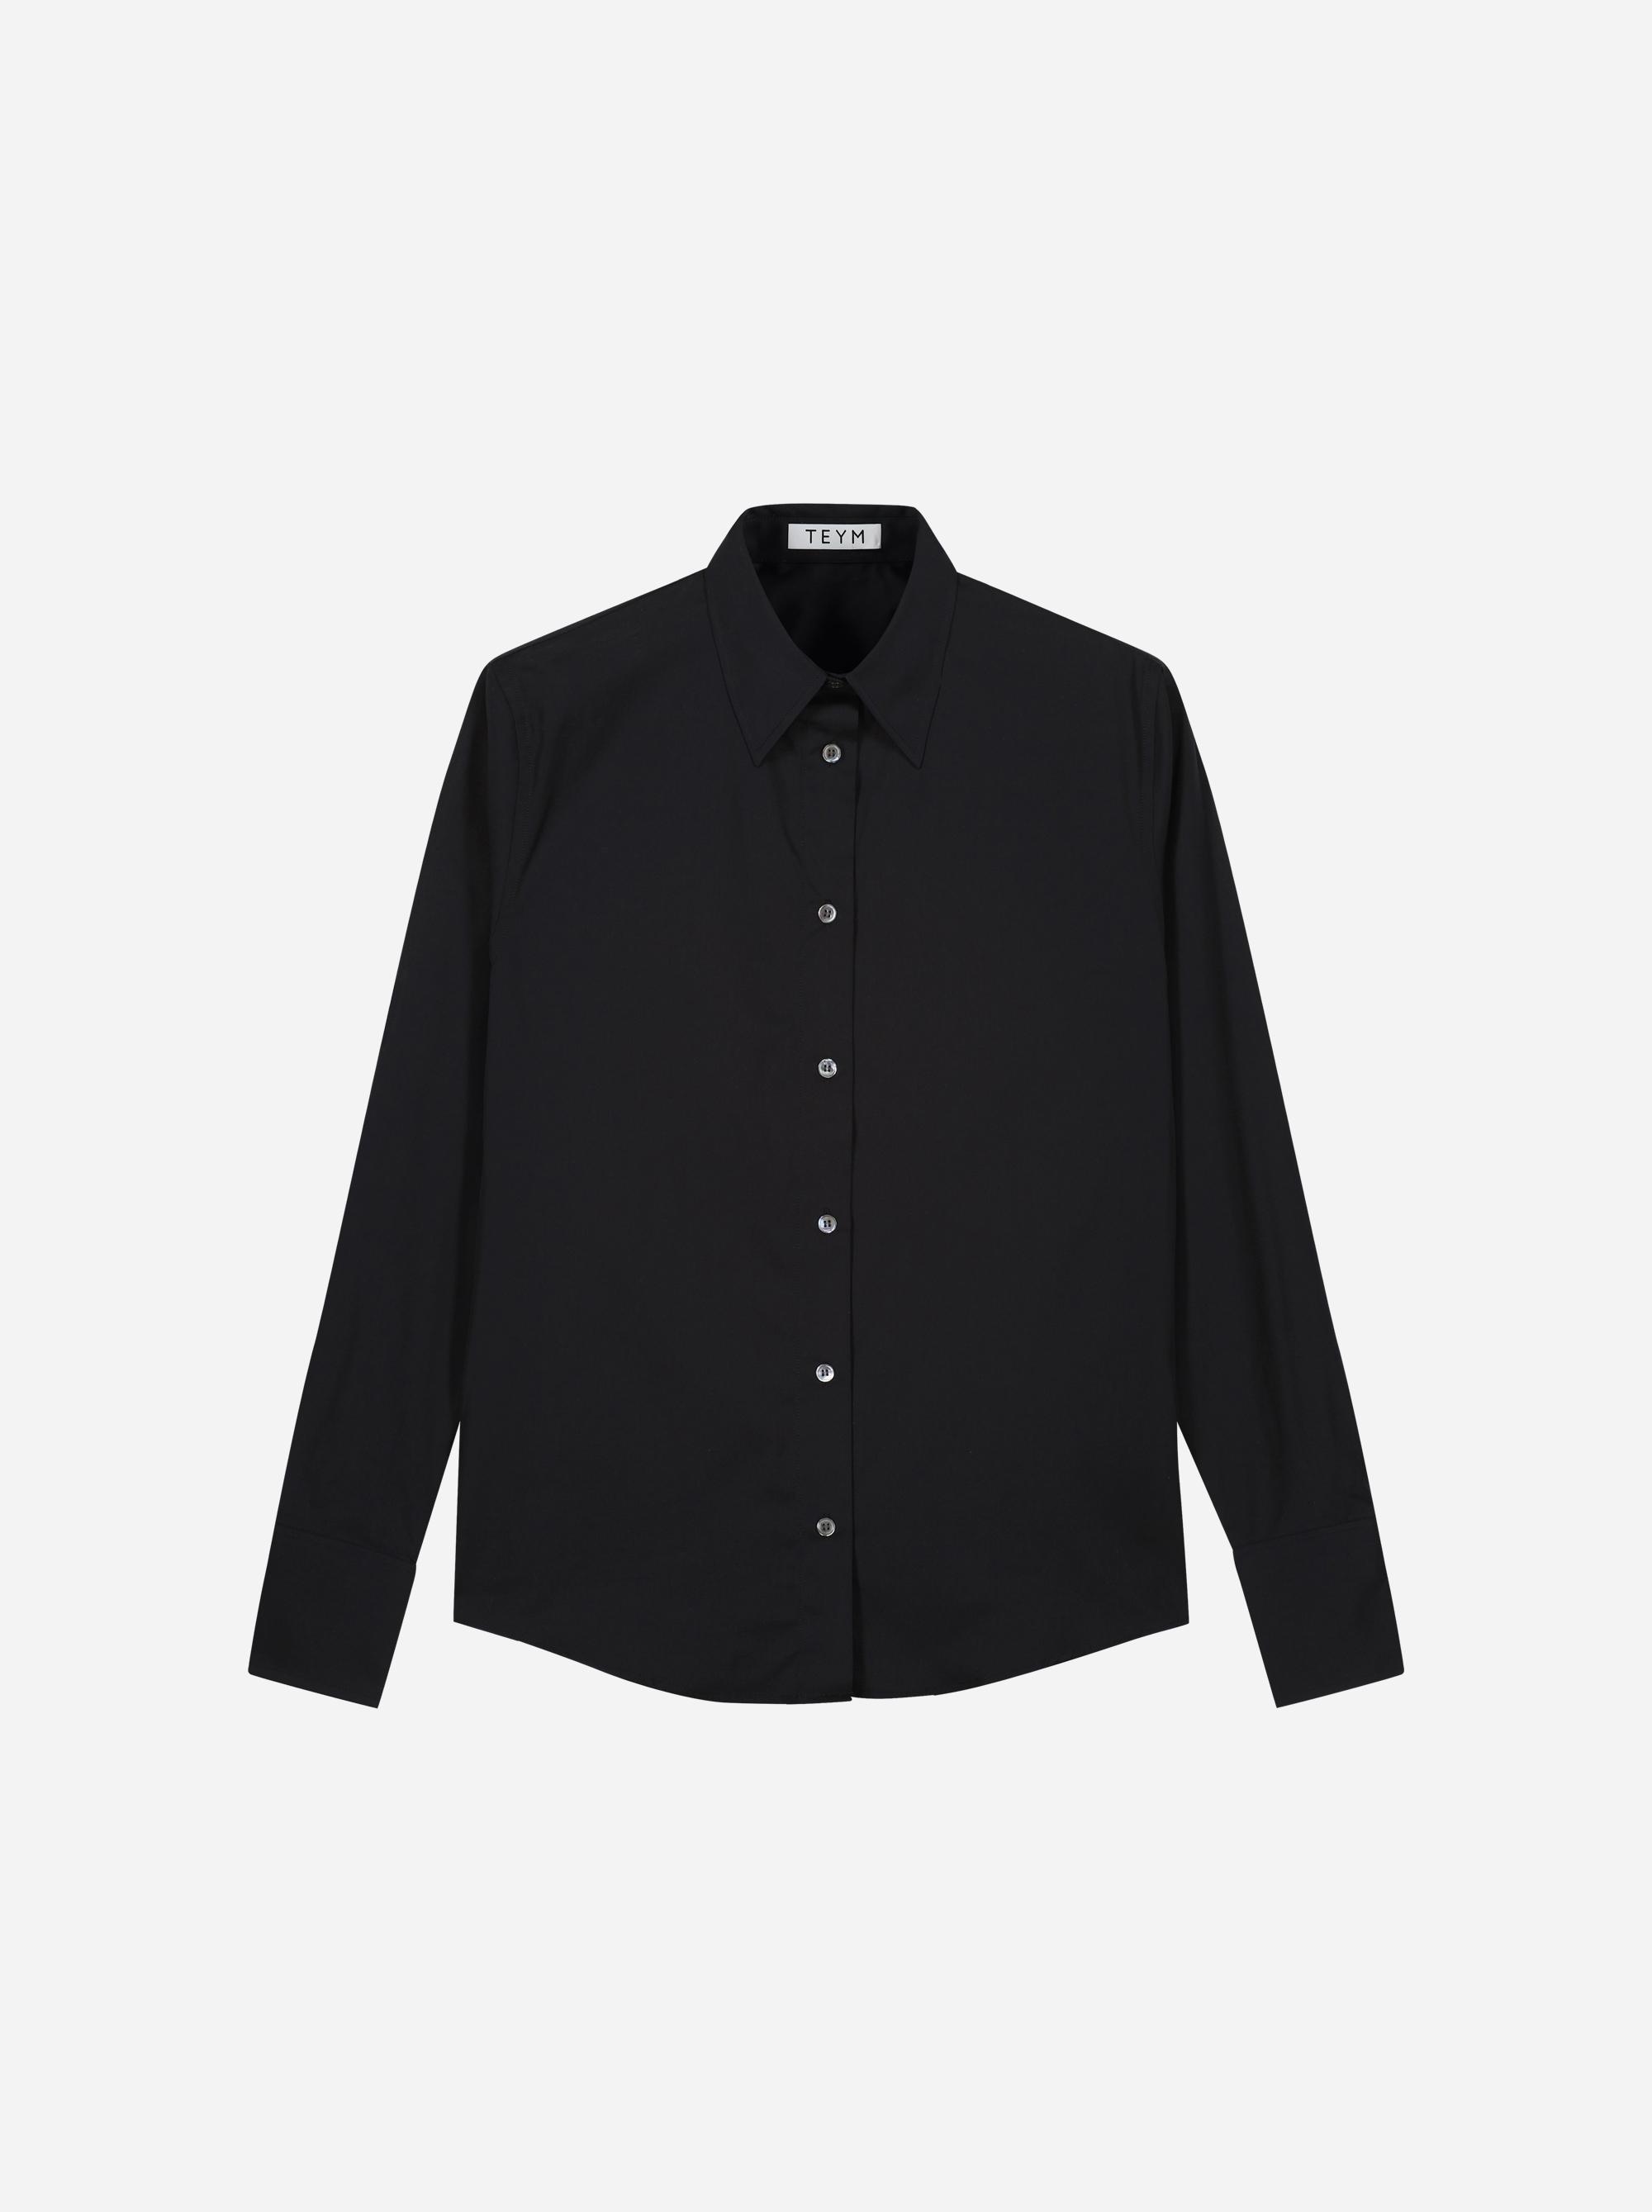 Teym_Shirt_Black_Women_front_1